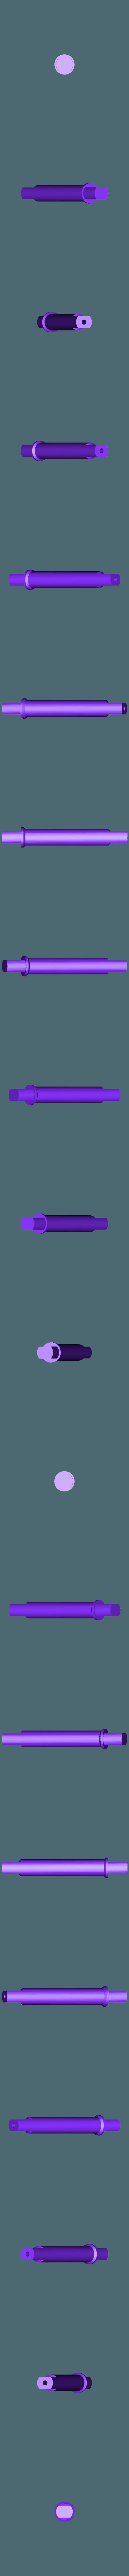 Truck_V4_Axle_Diff_Halfshaft.STL Download STL file 3D Printed Rc Truck V4 • 3D printable template, MrCrankyface